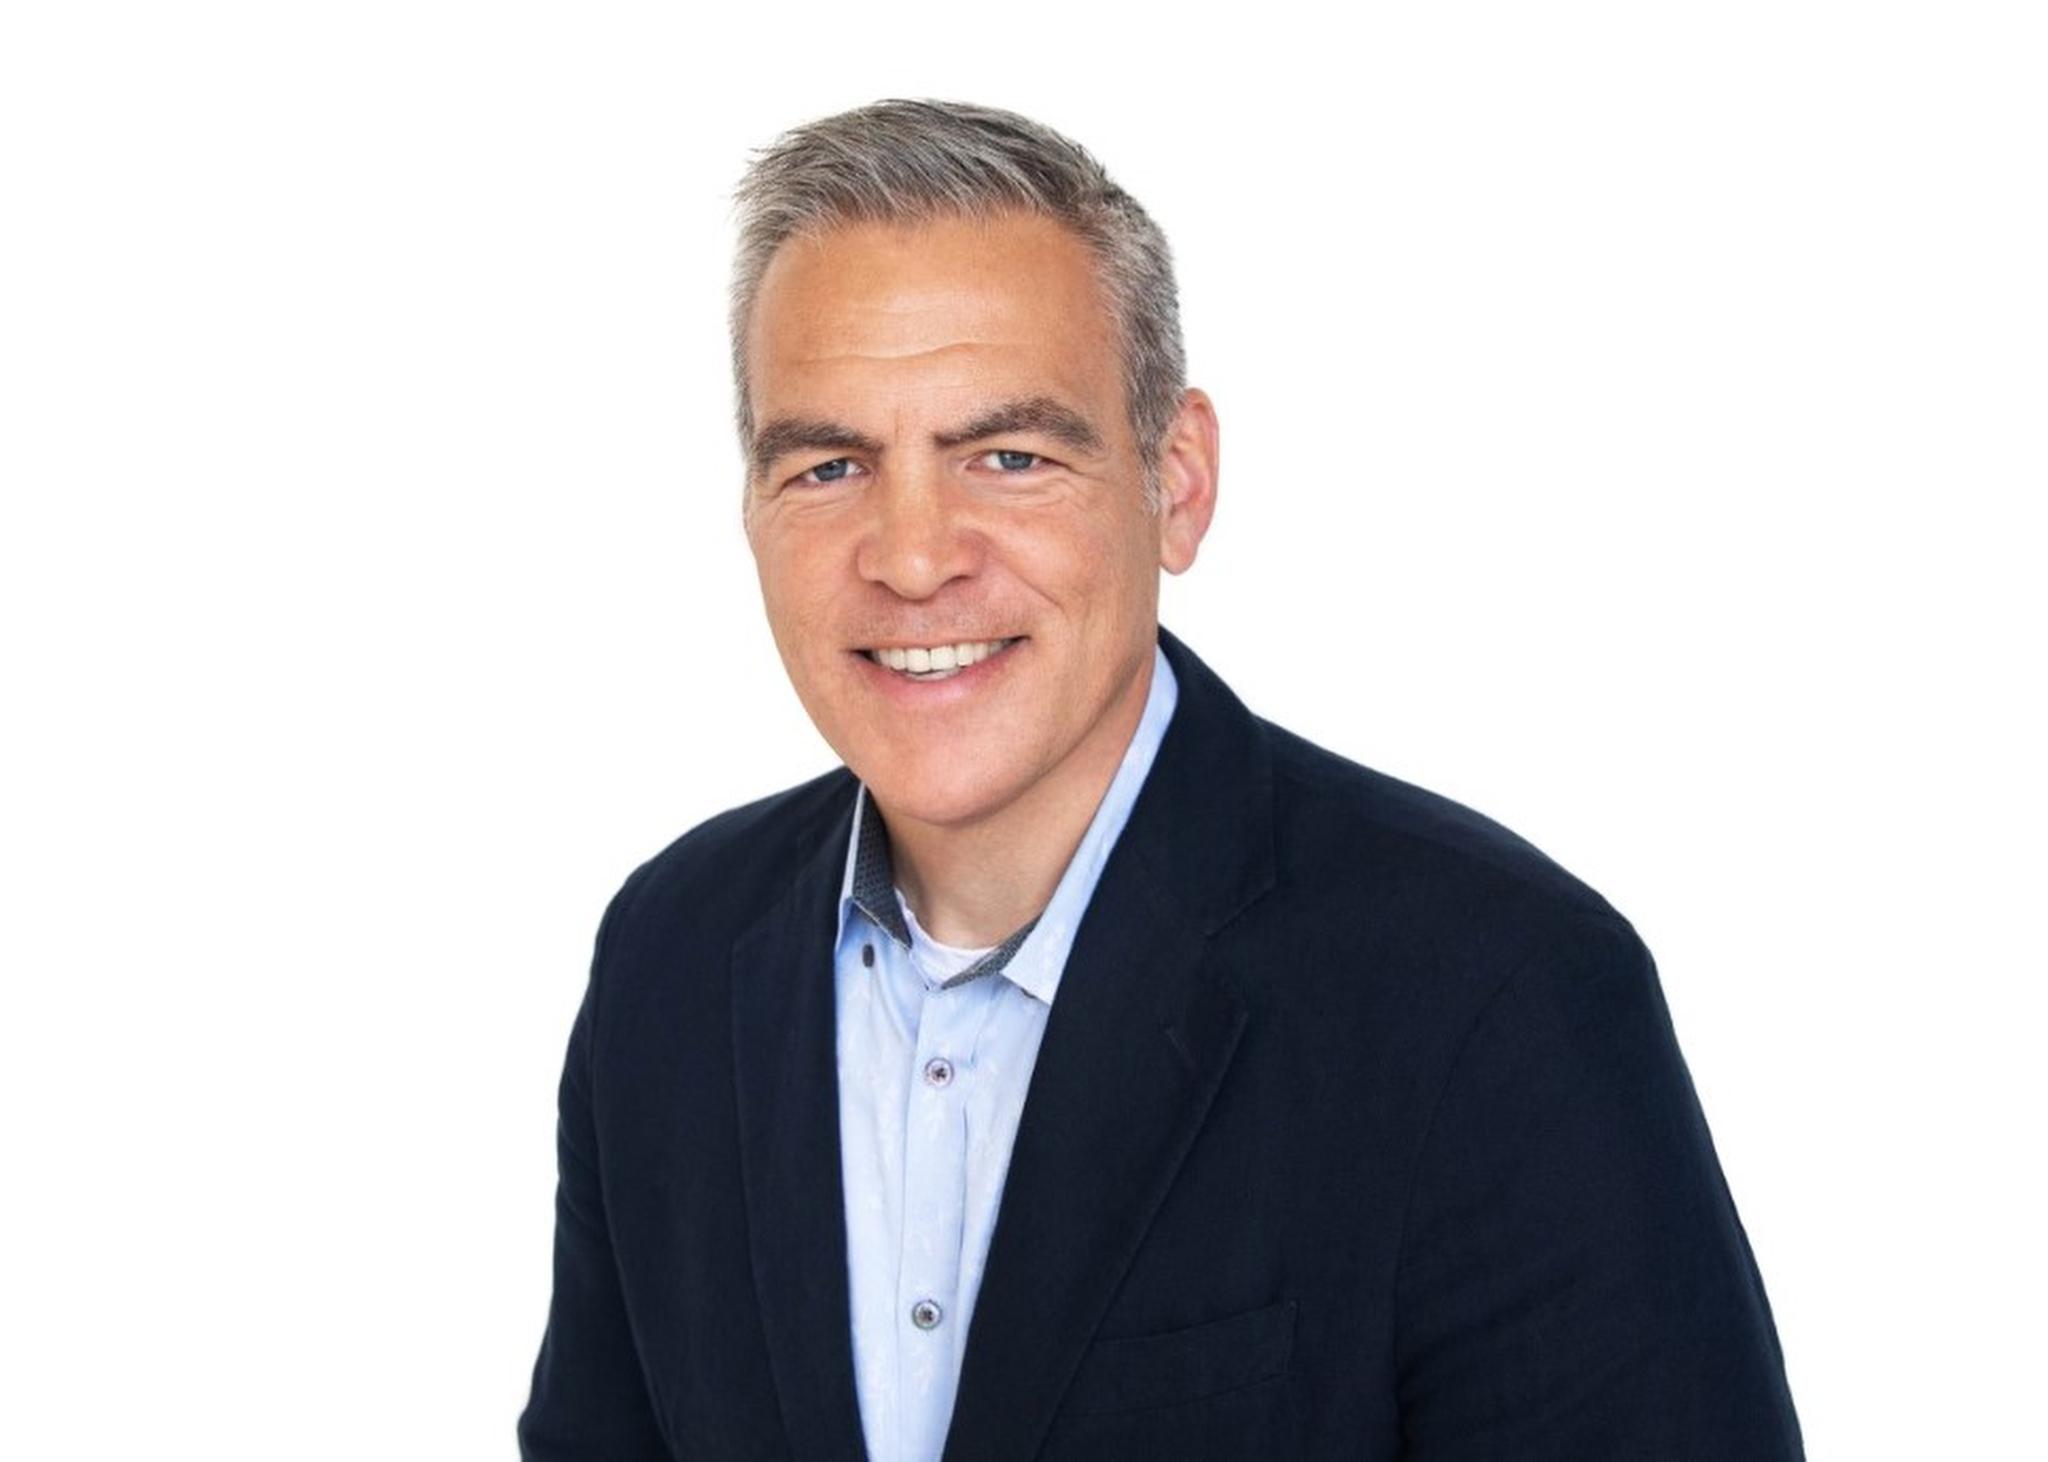 Bob Kupbens